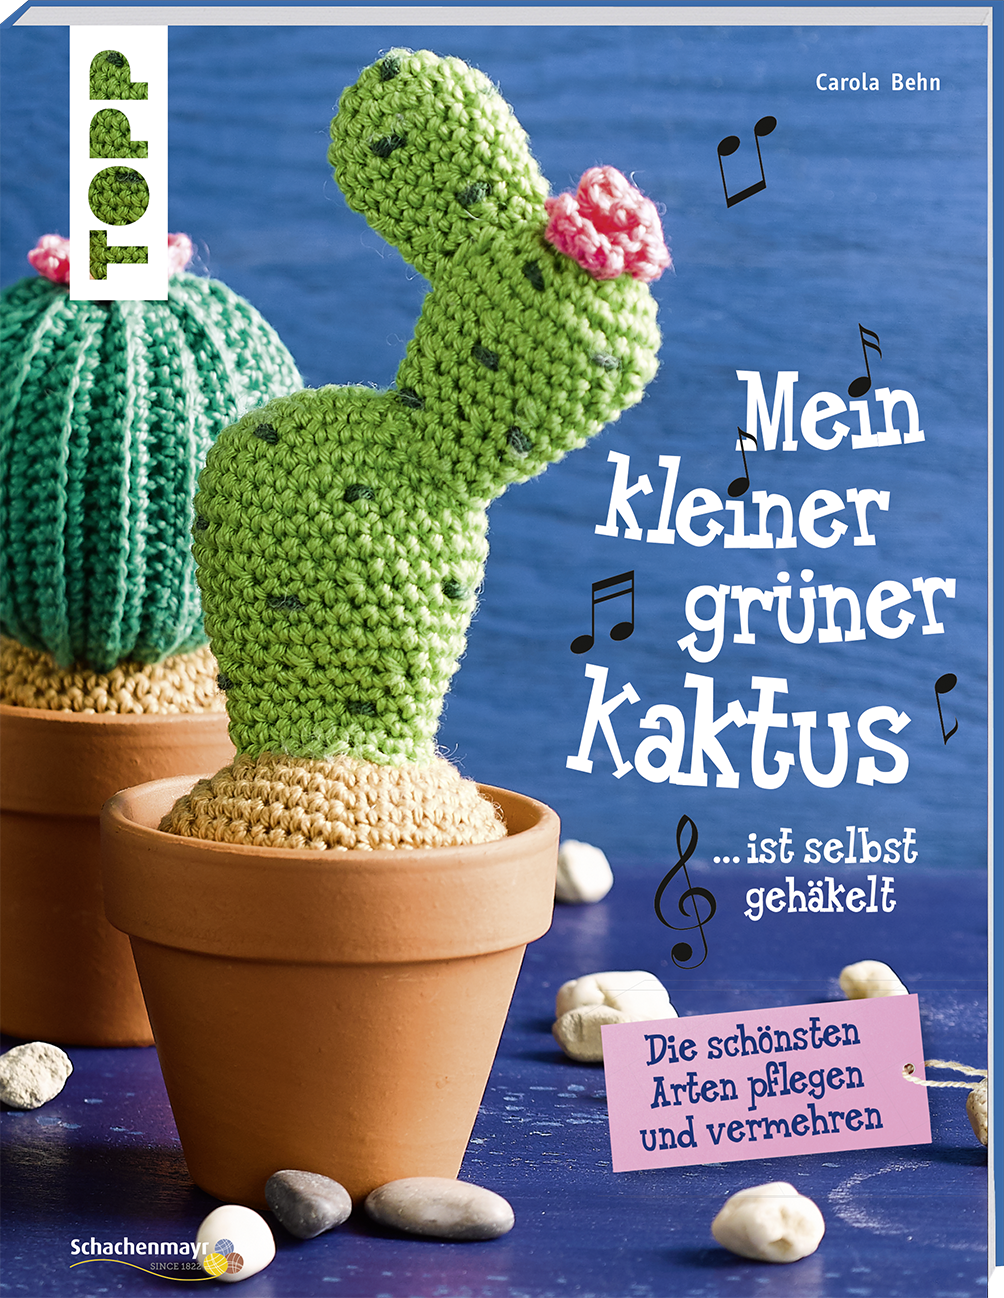 Mein Kleiner Gruner Kaktus Ist Selbst Gehakelt Kreativ Kompakt